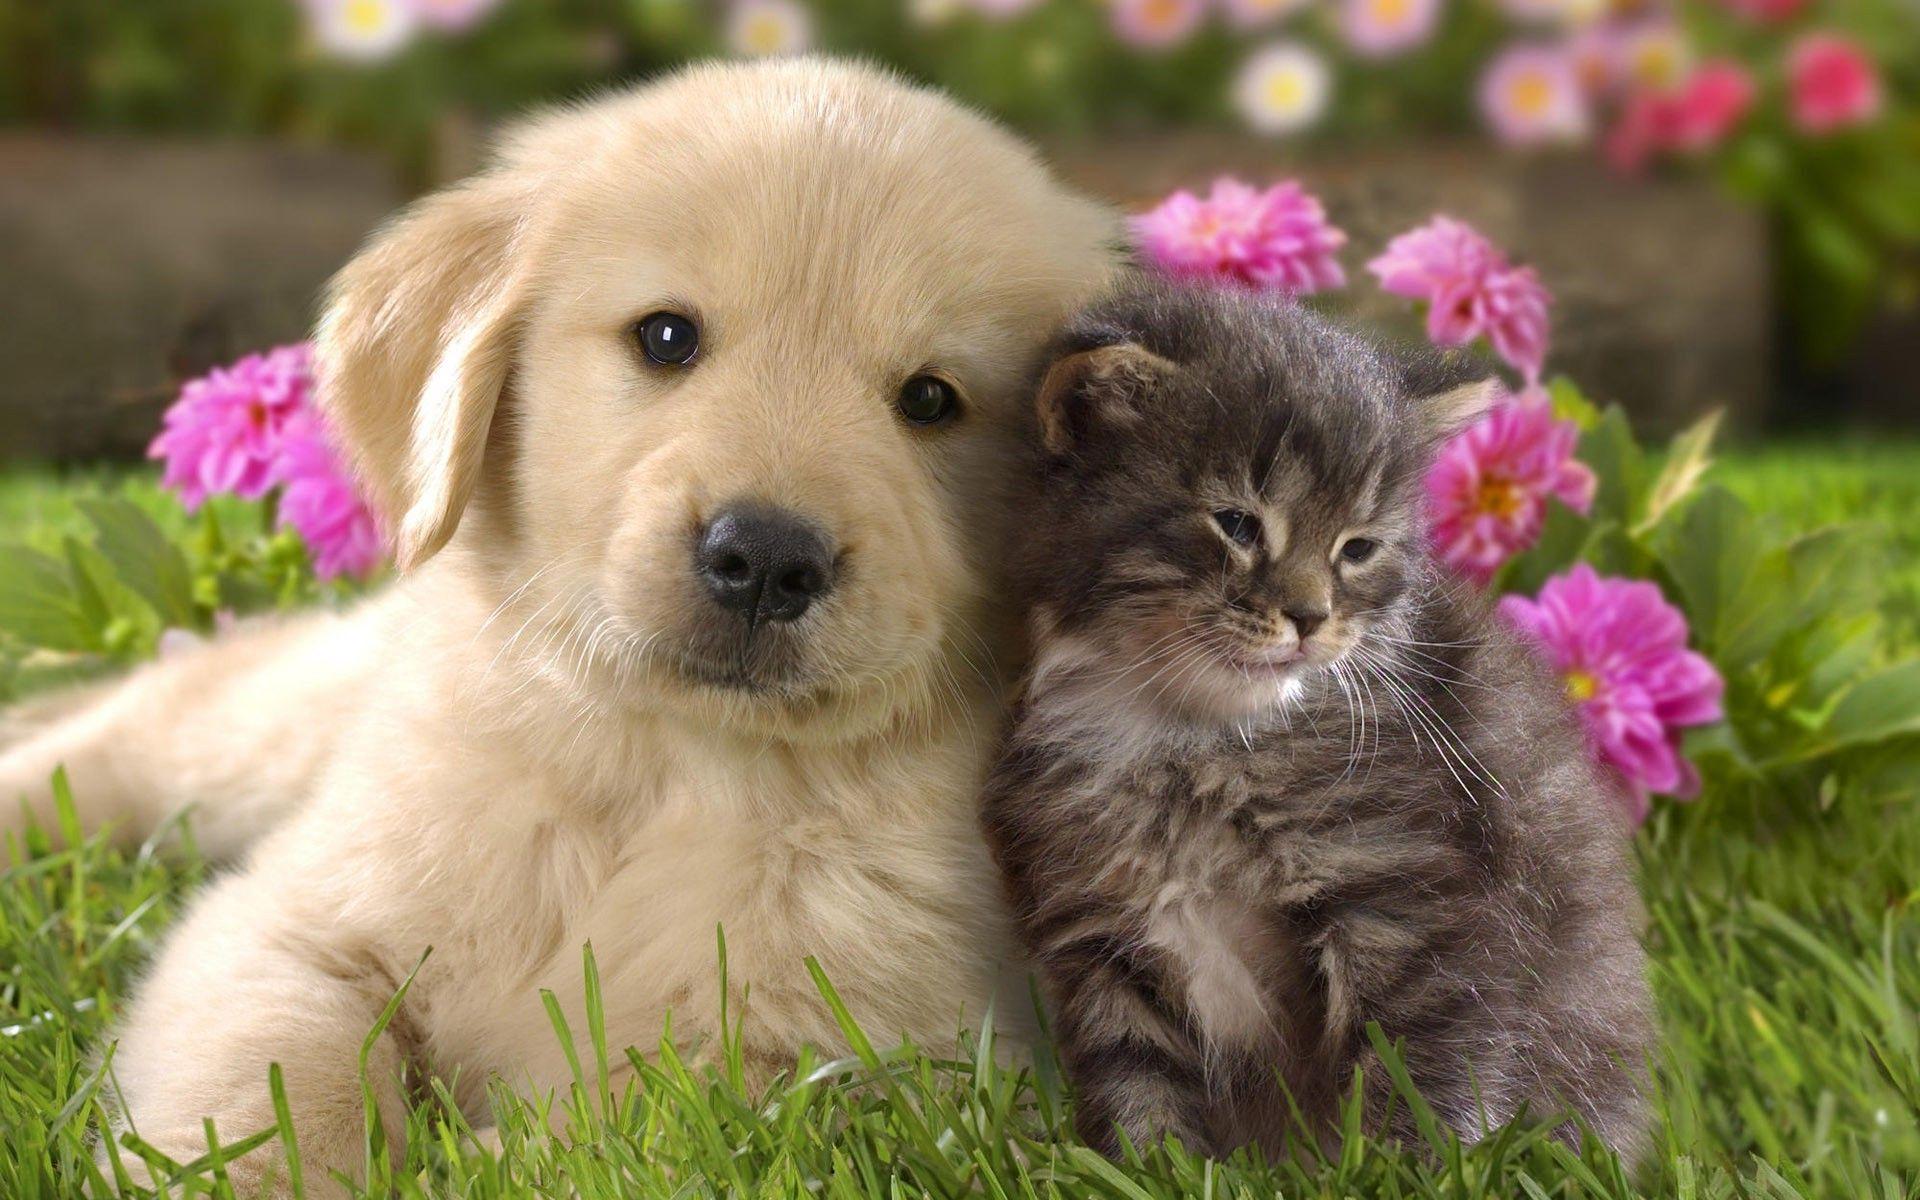 Cute Dog And Cat Wallpaper Tablolar